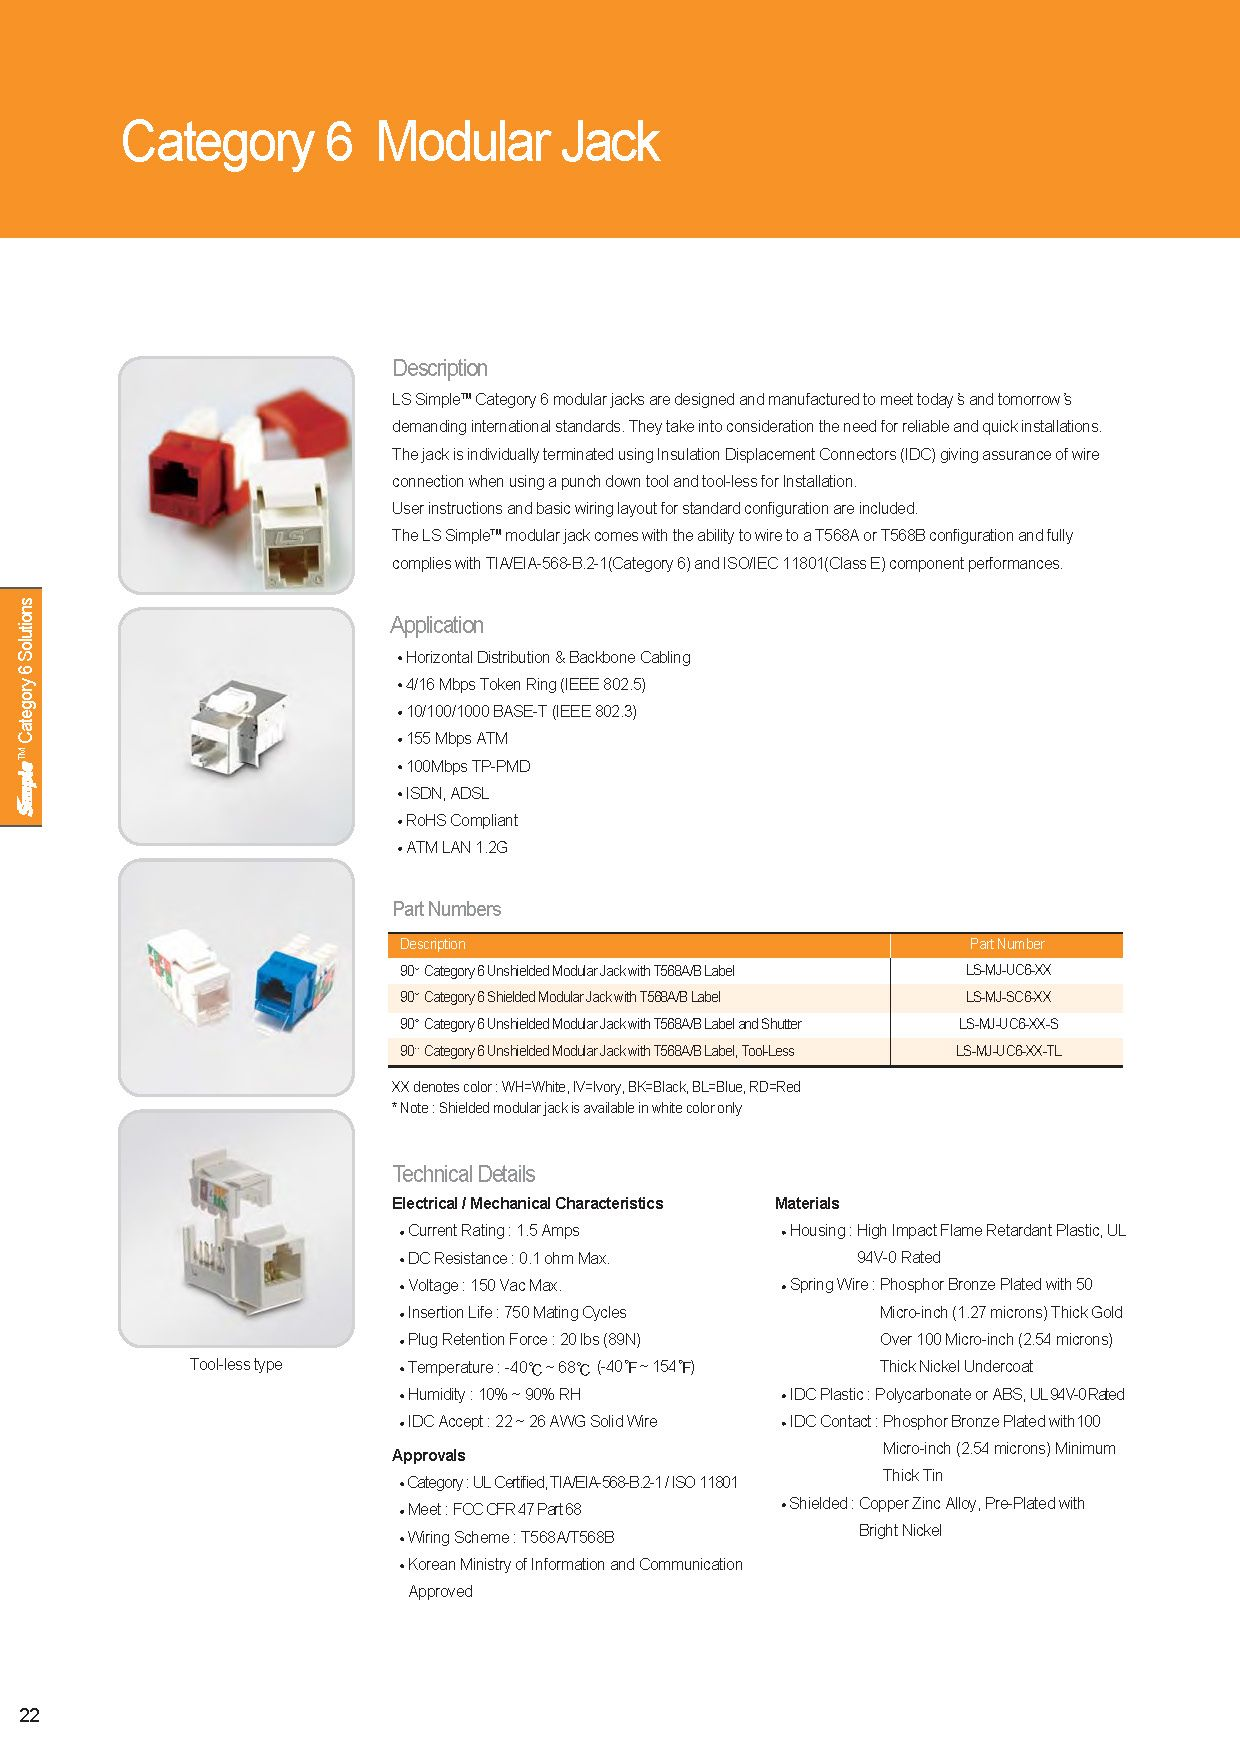 LS Cable & System Modular Jack Cat 6 specsheet